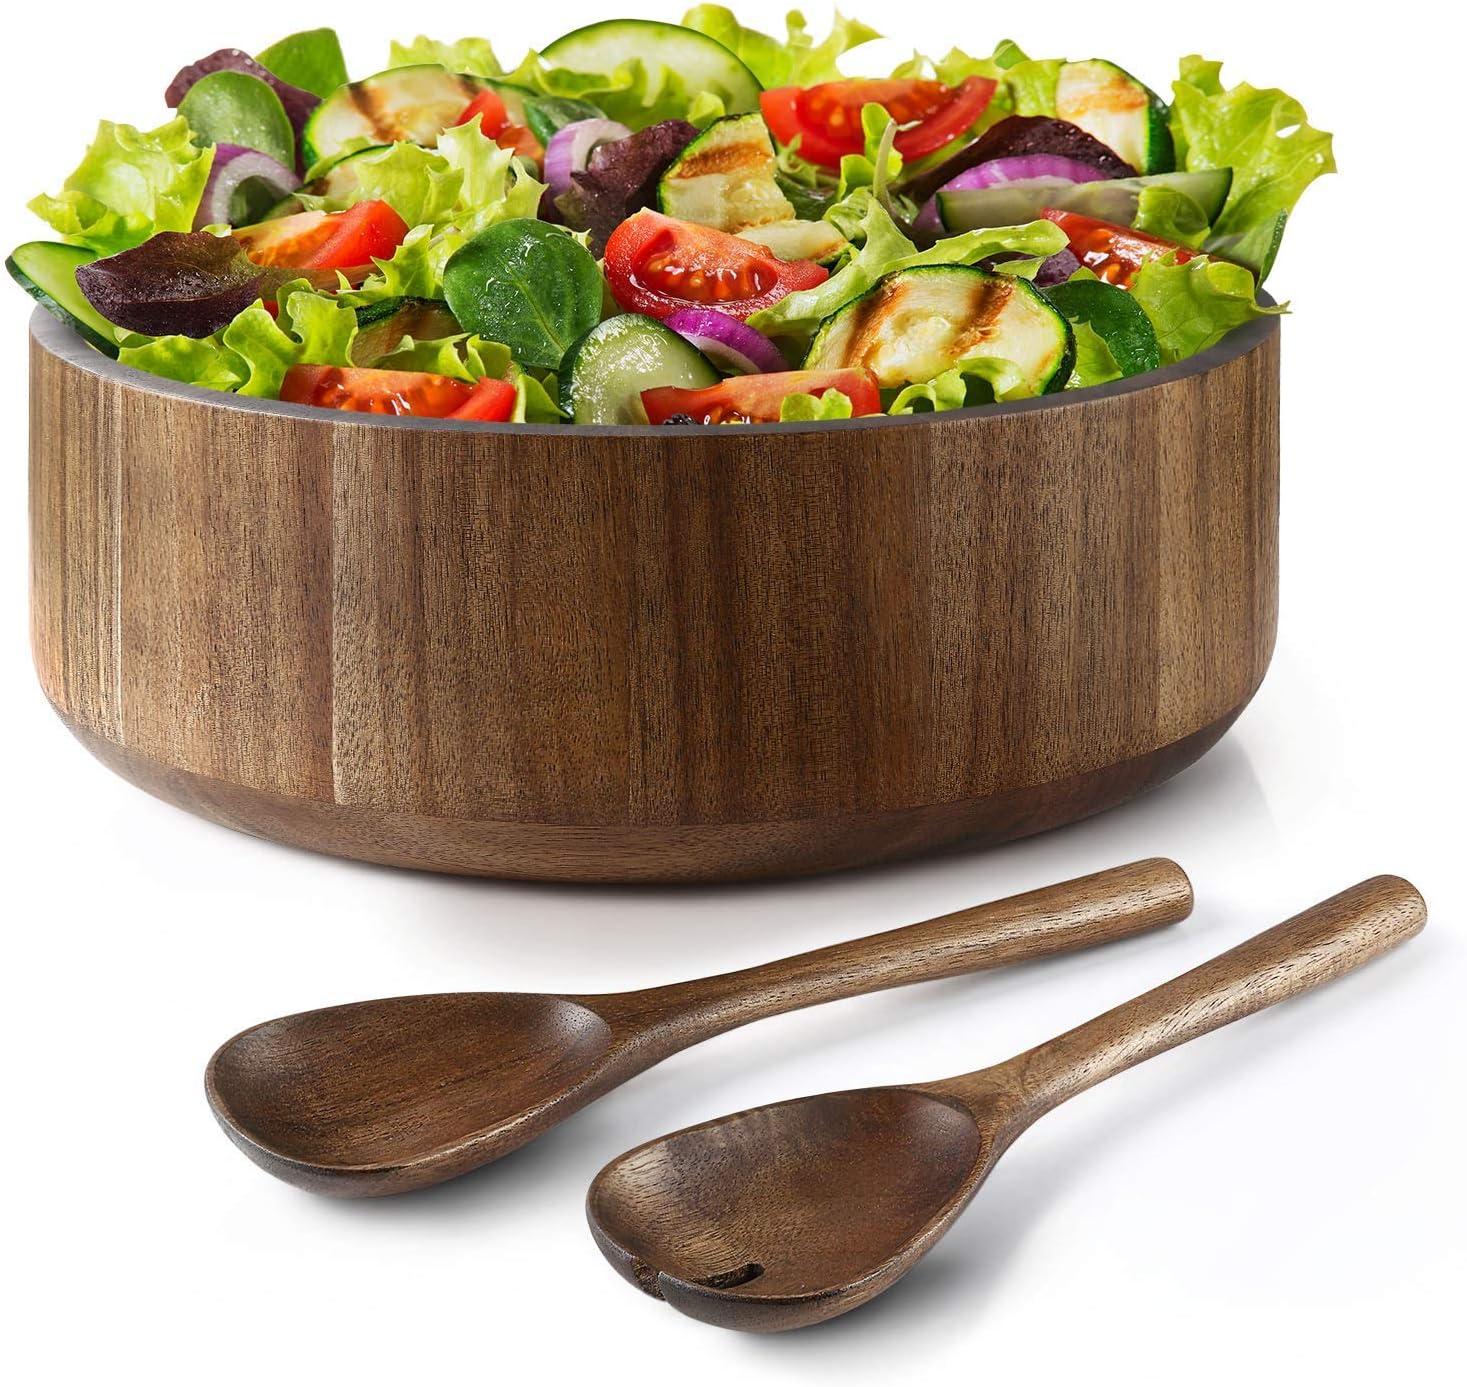 Miusco Natural Acacia Wooden Large Serving online shop Regular store with Bowl Tongs Salad